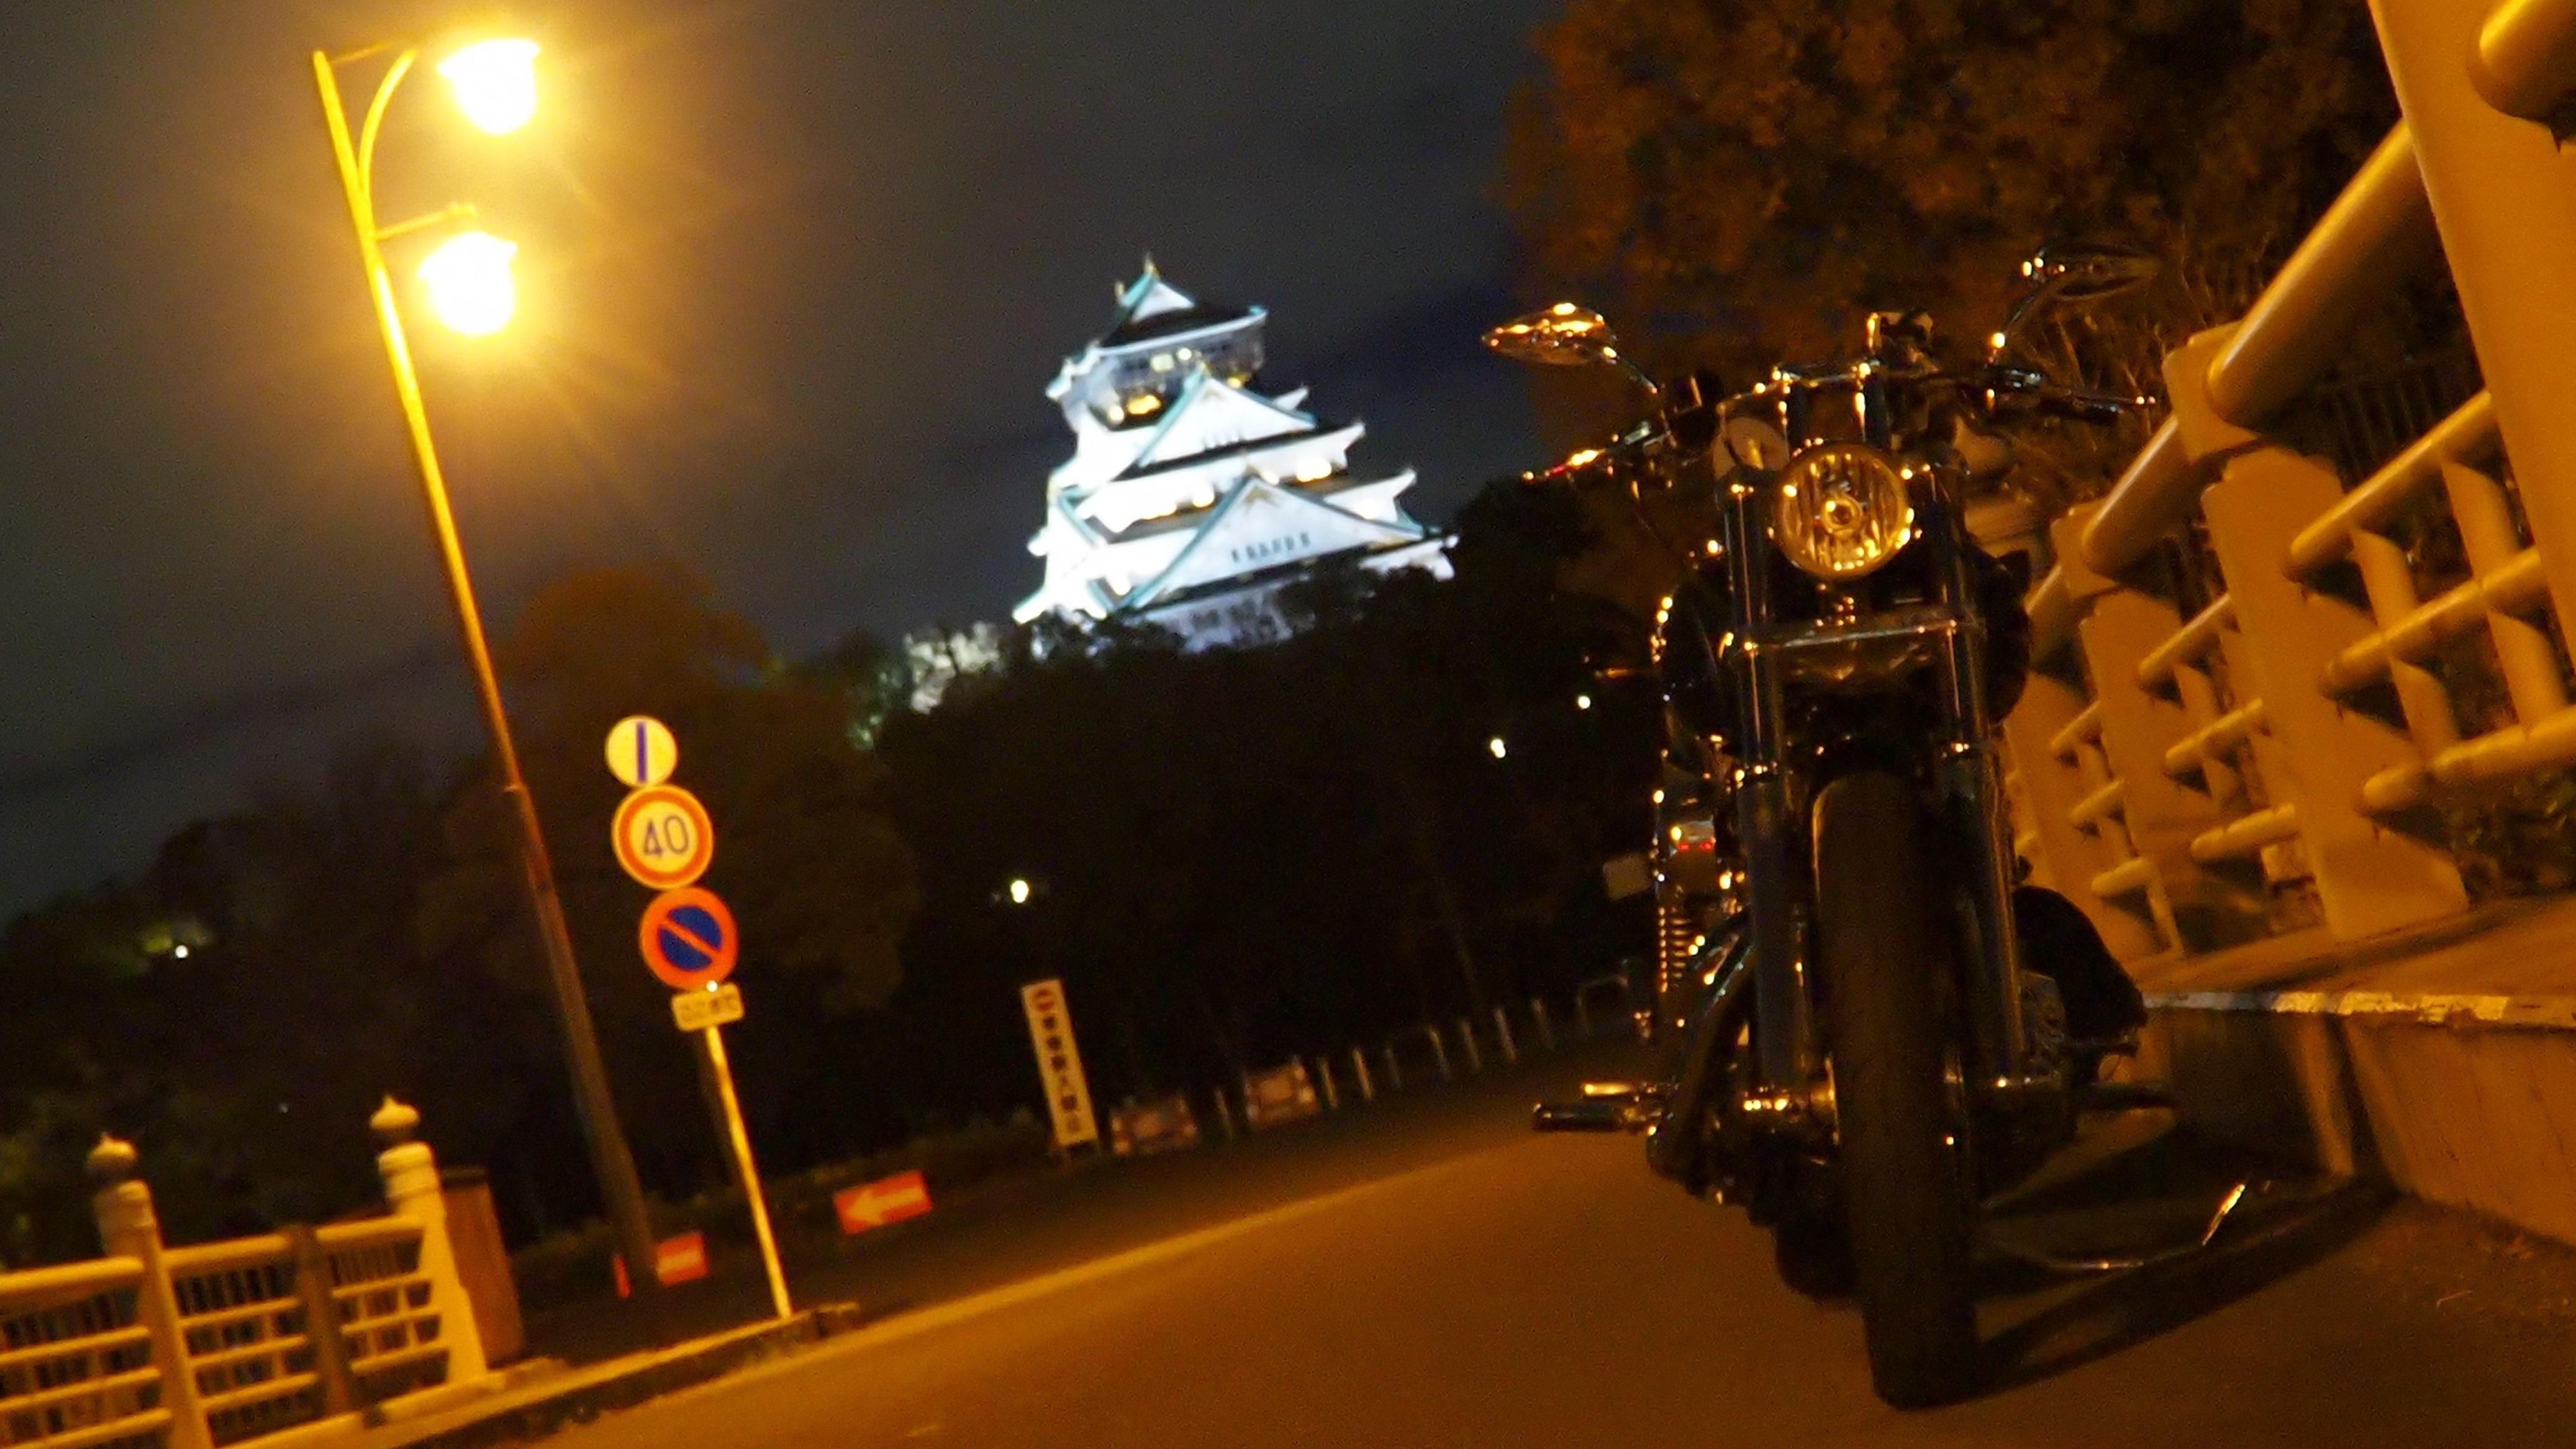 harleydavidson-motorcycle-touring-blog-osaka-nightouringt-osakacastle-nightview-2.jpg